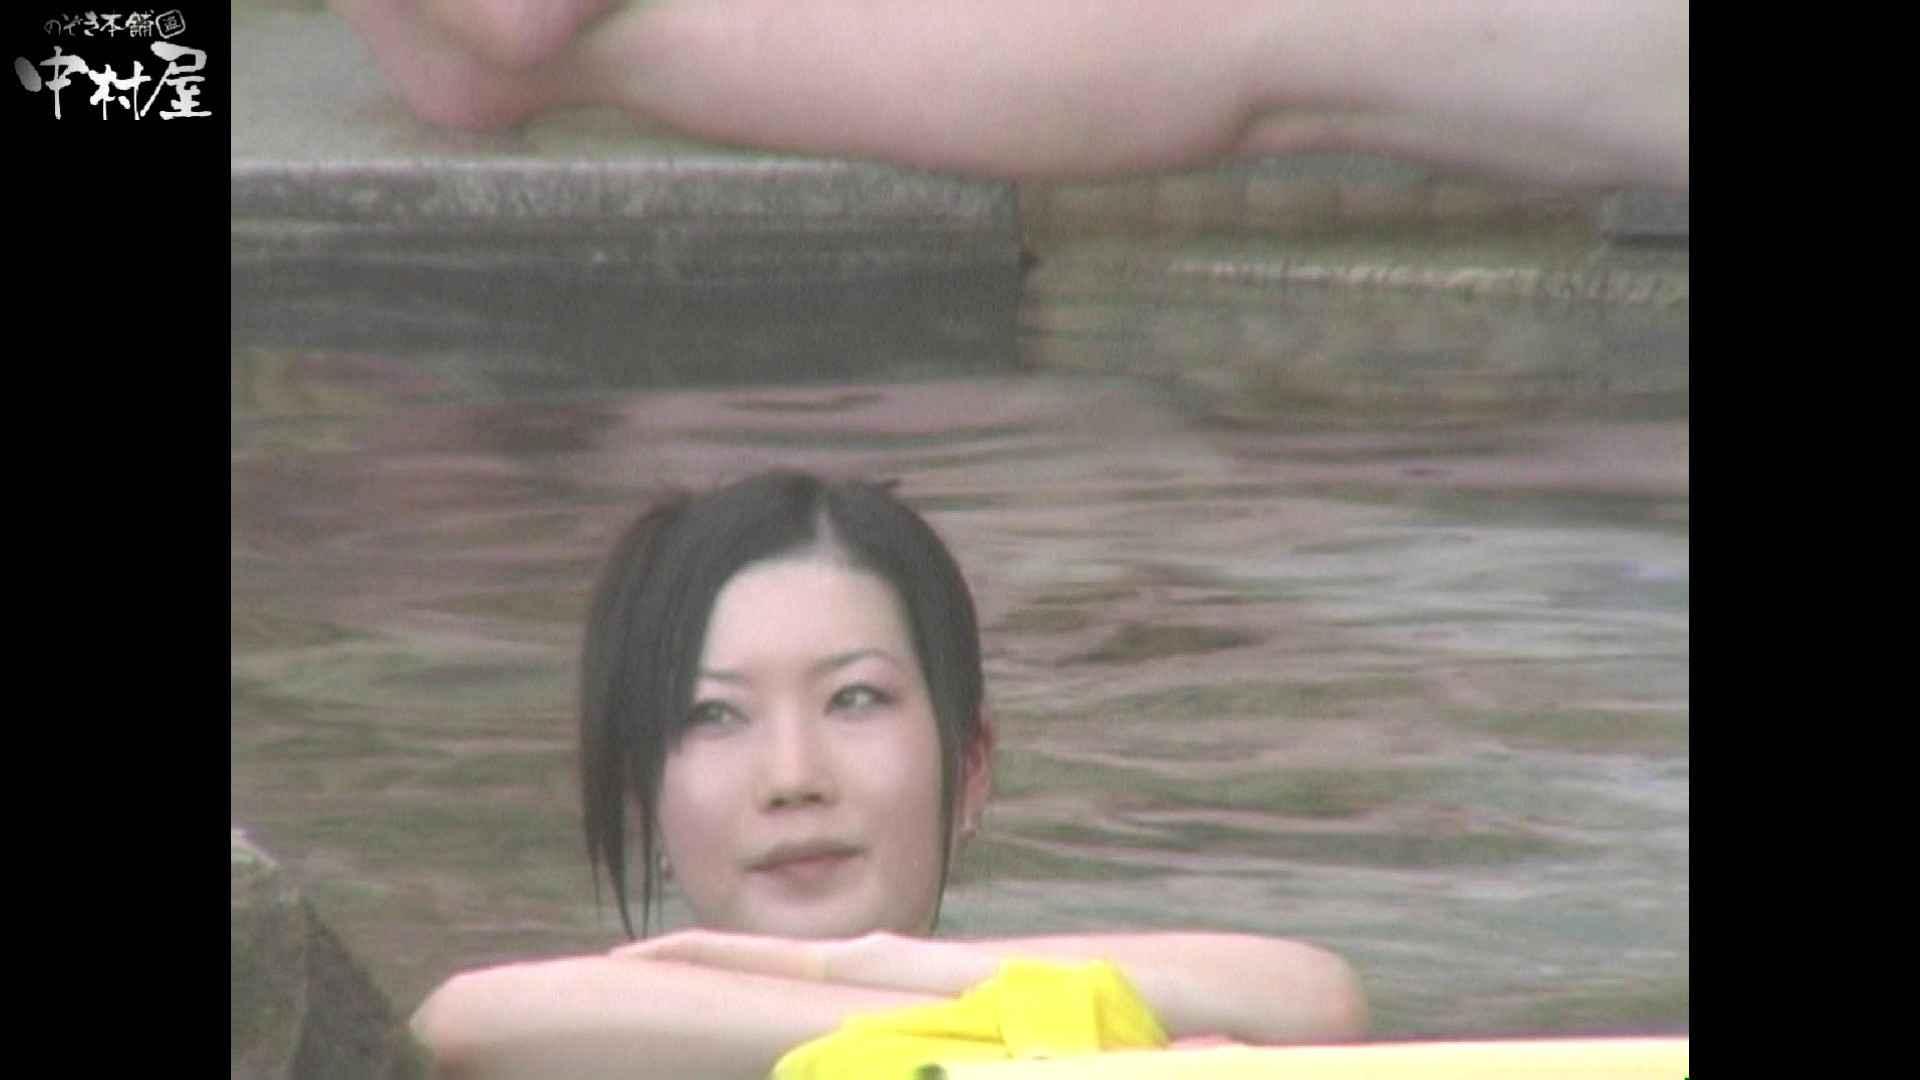 Aquaな露天風呂Vol.940 OLセックス | 露天  98画像 28